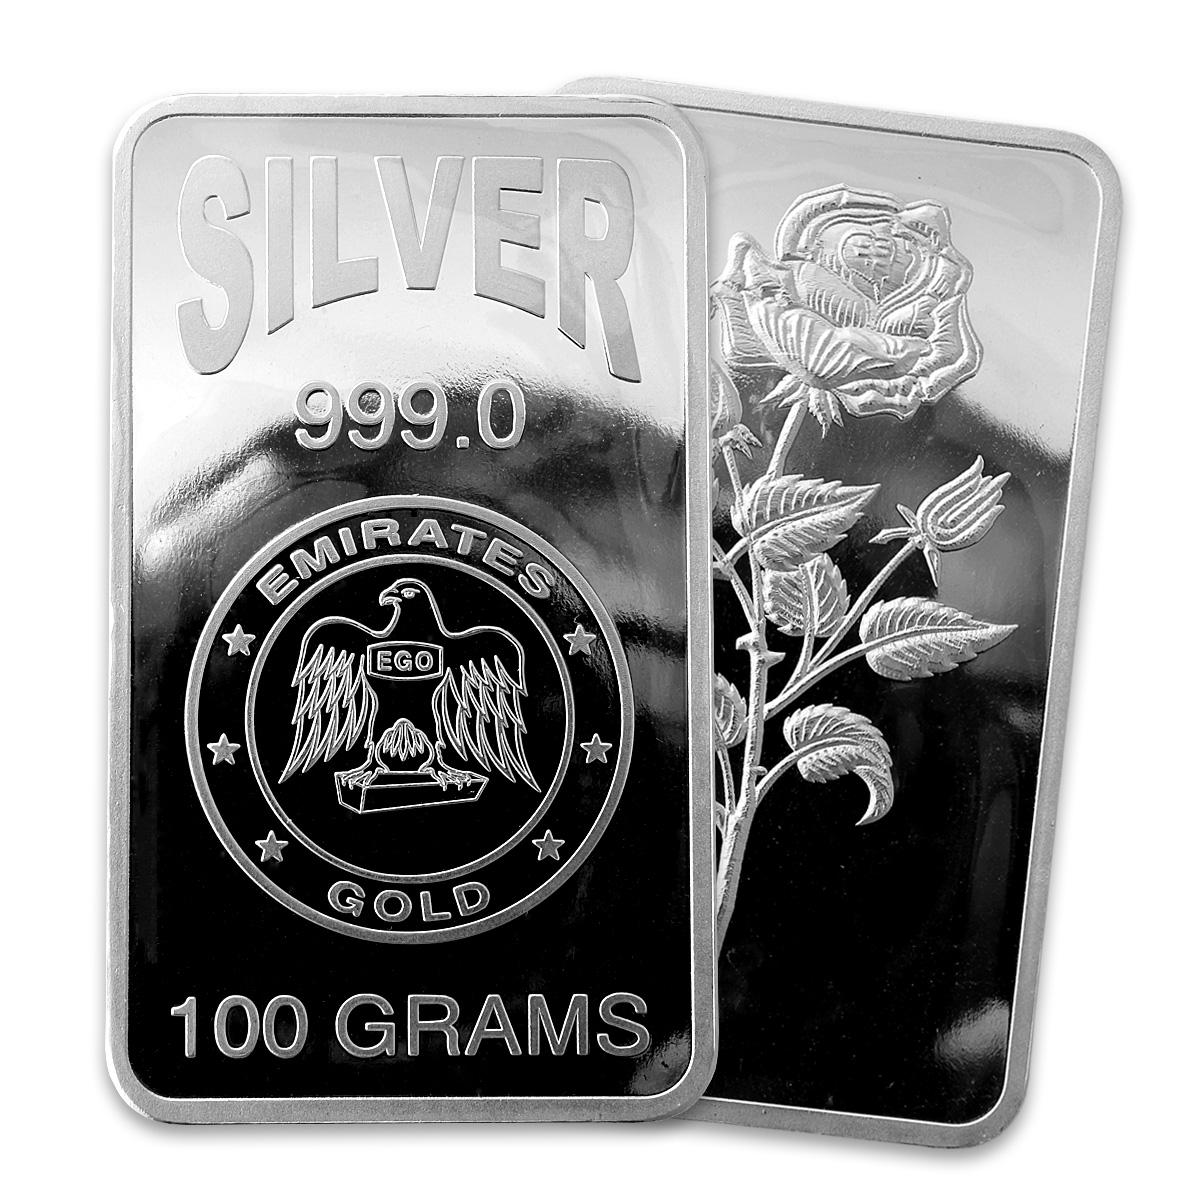 2 серебряных слитка на белом фоне